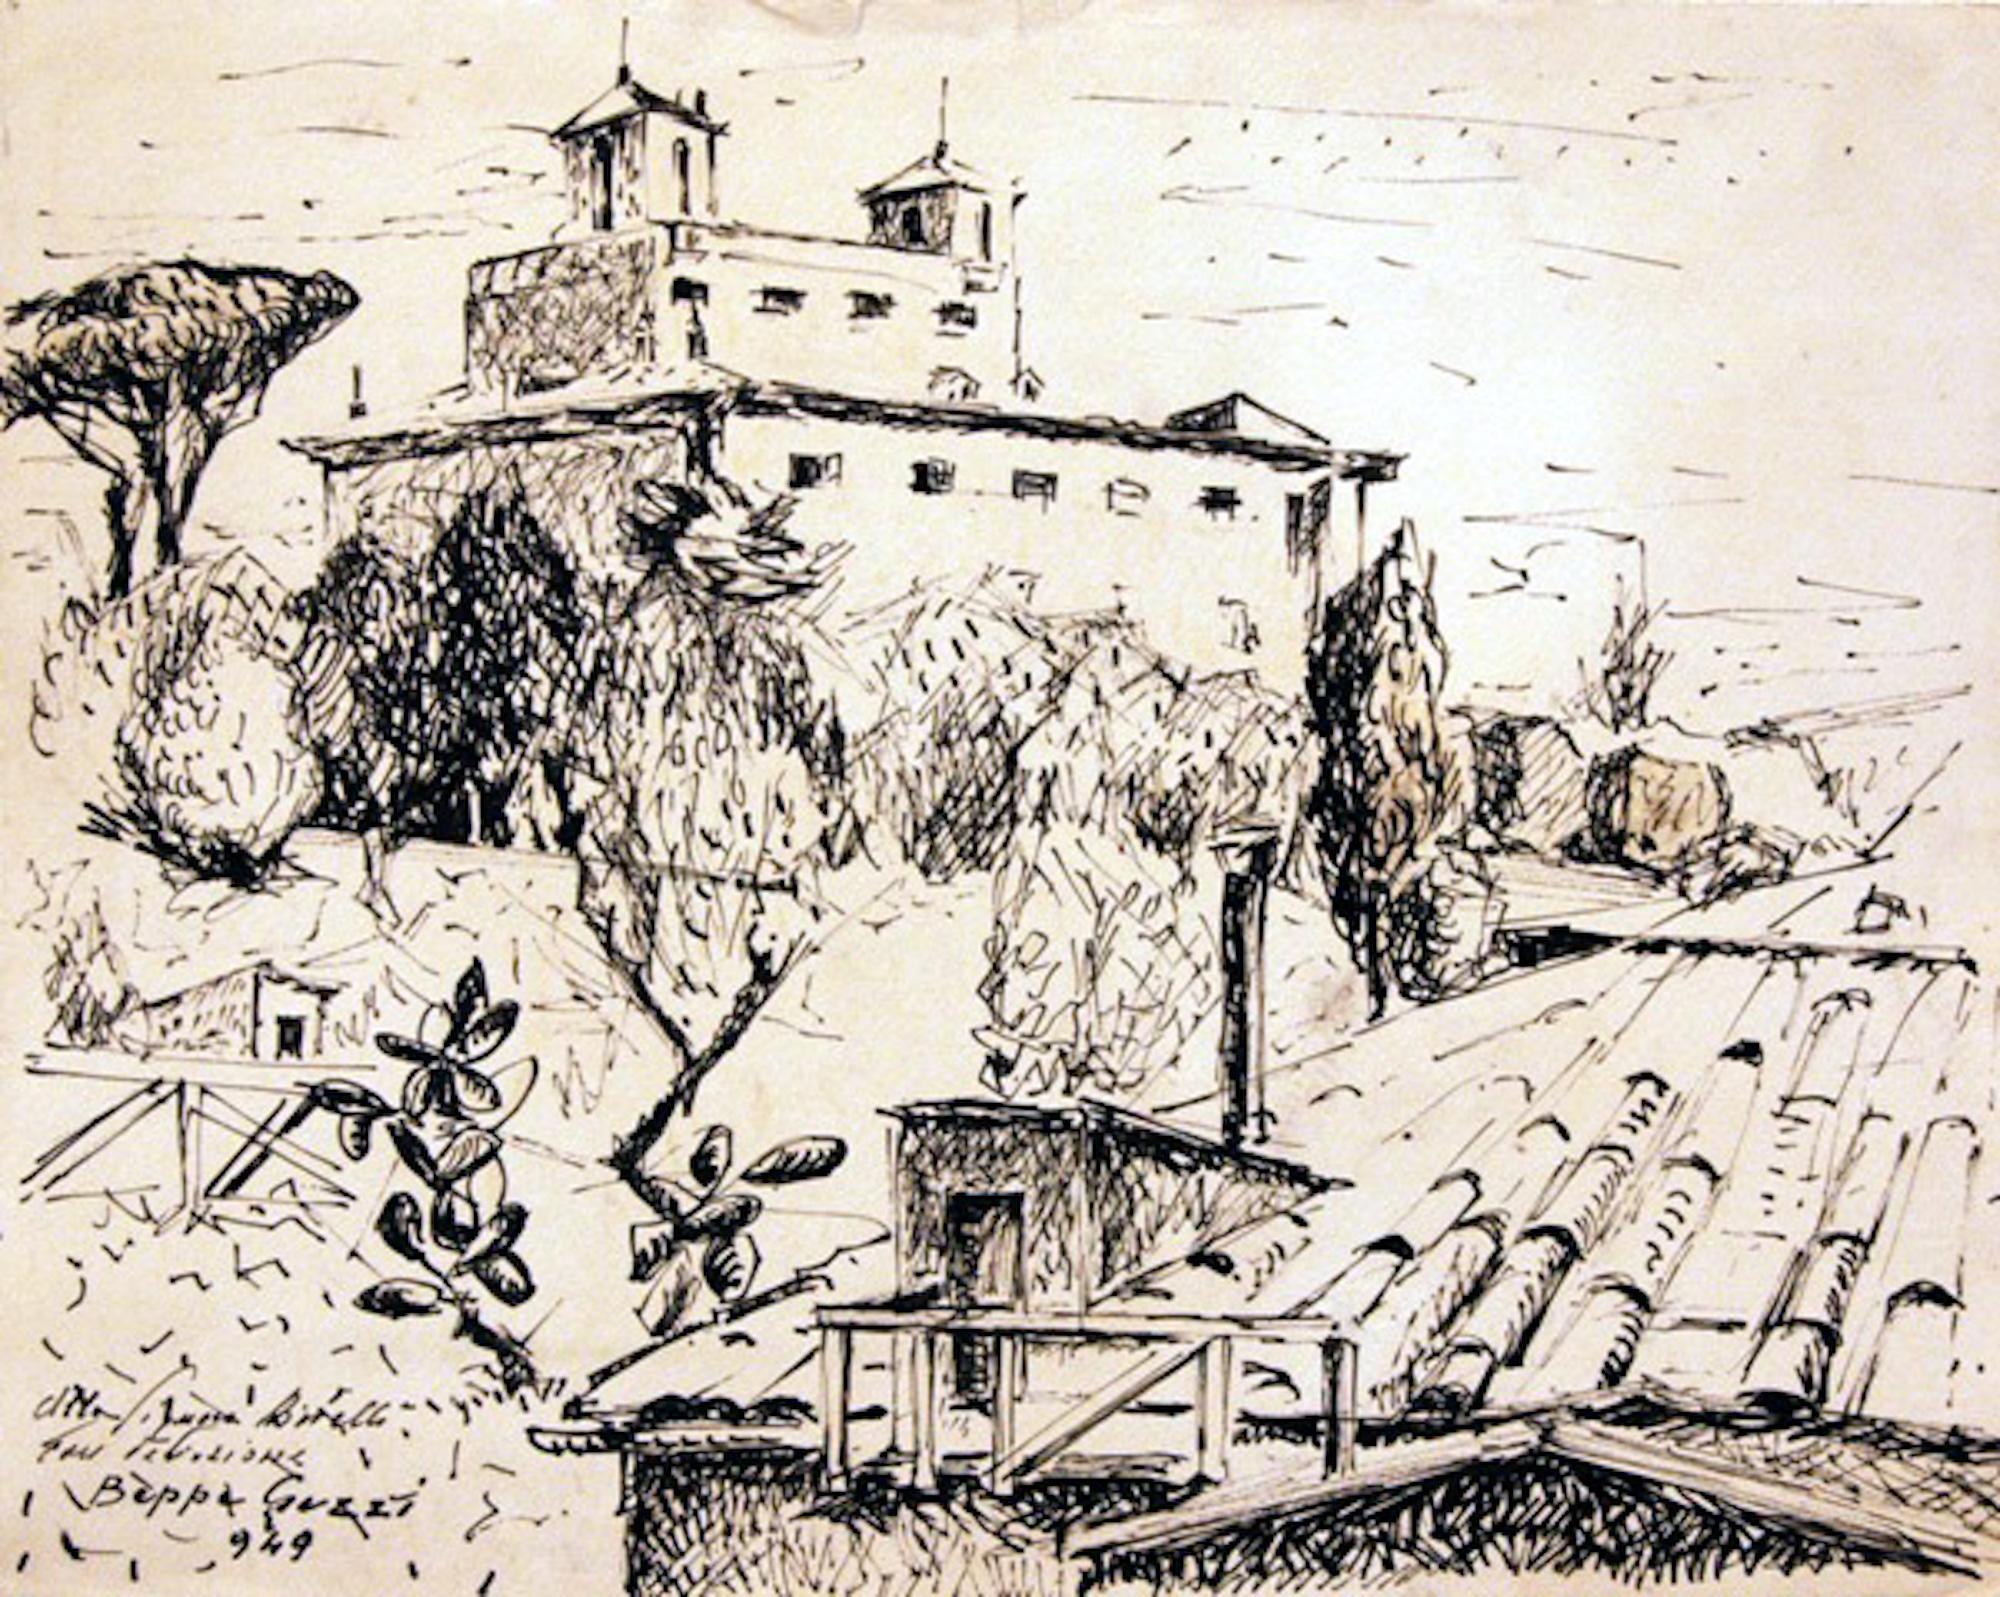 Villa Medici / Rome - Original Ink Drawing by Beppe Guzzi - 1949